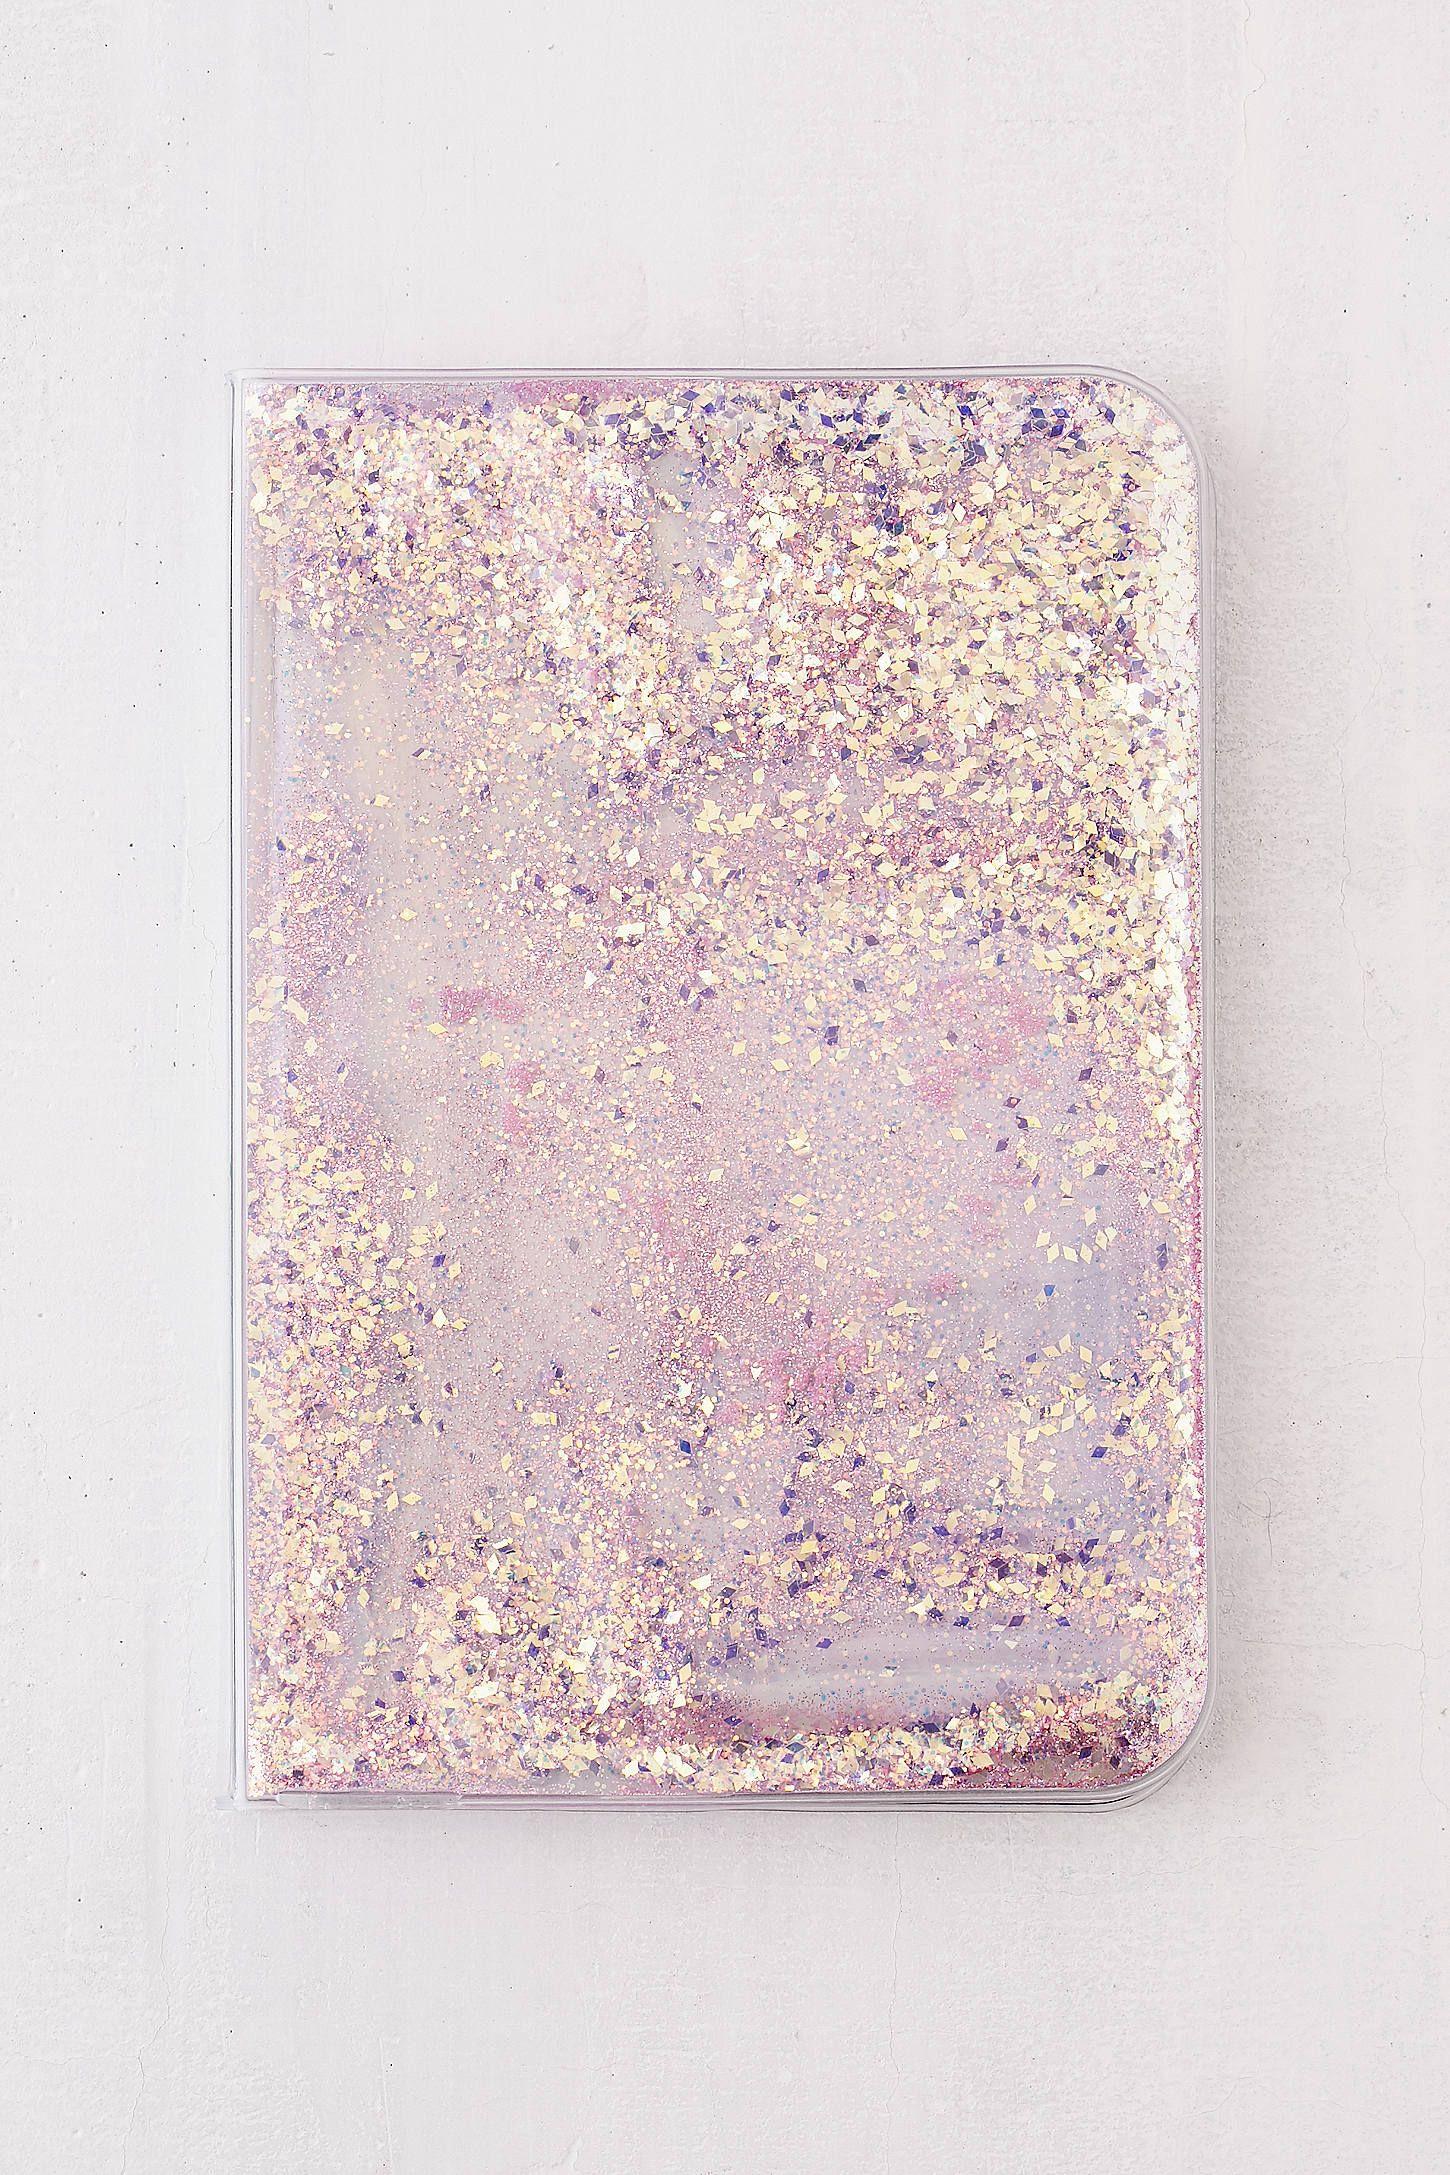 Screen Printing Medium for Glitter Unicorn Colour Glitter Binder